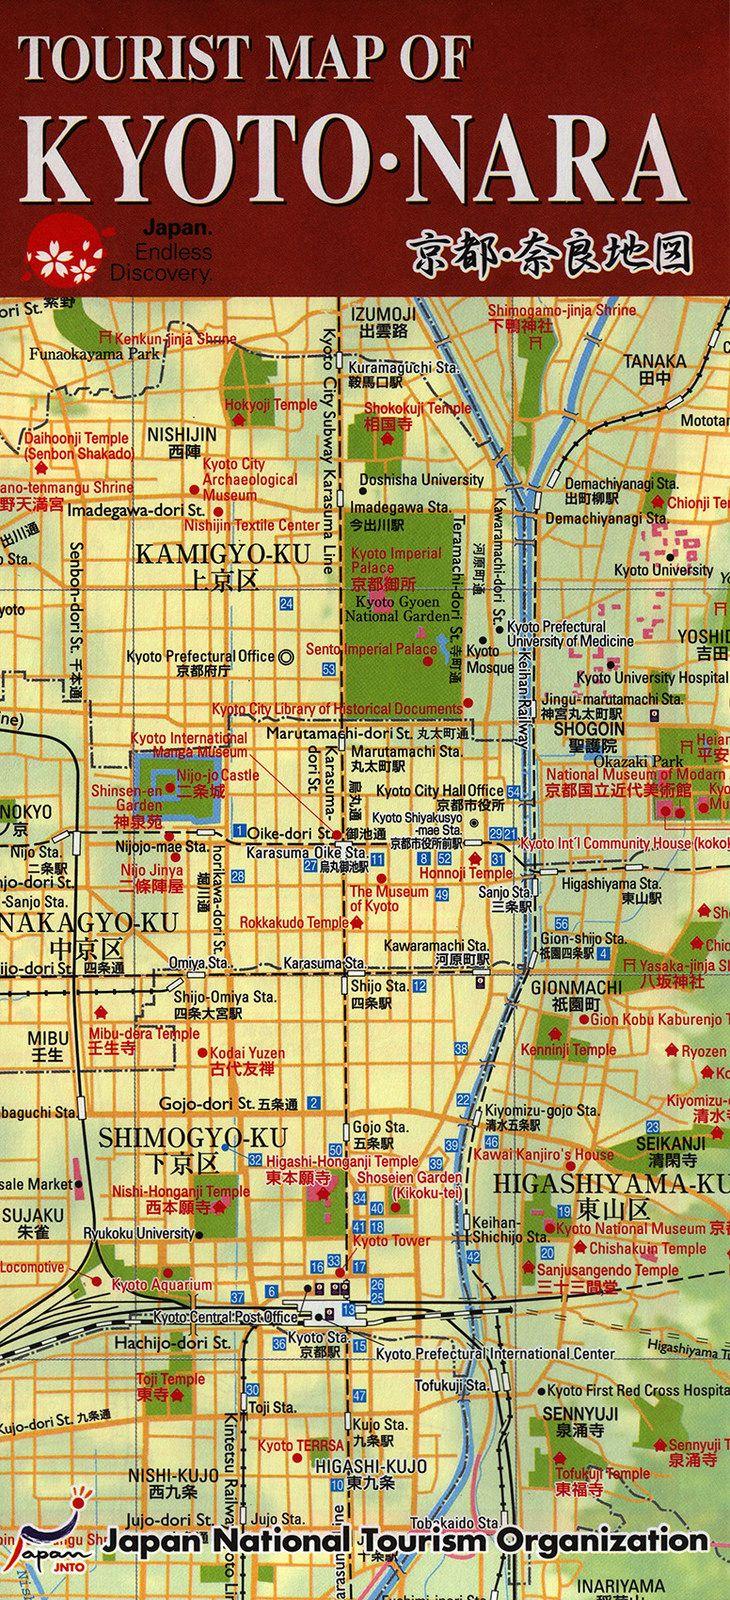 Tourist Map of Kyoto Nara 20151 Japan Japan tourism Tourist